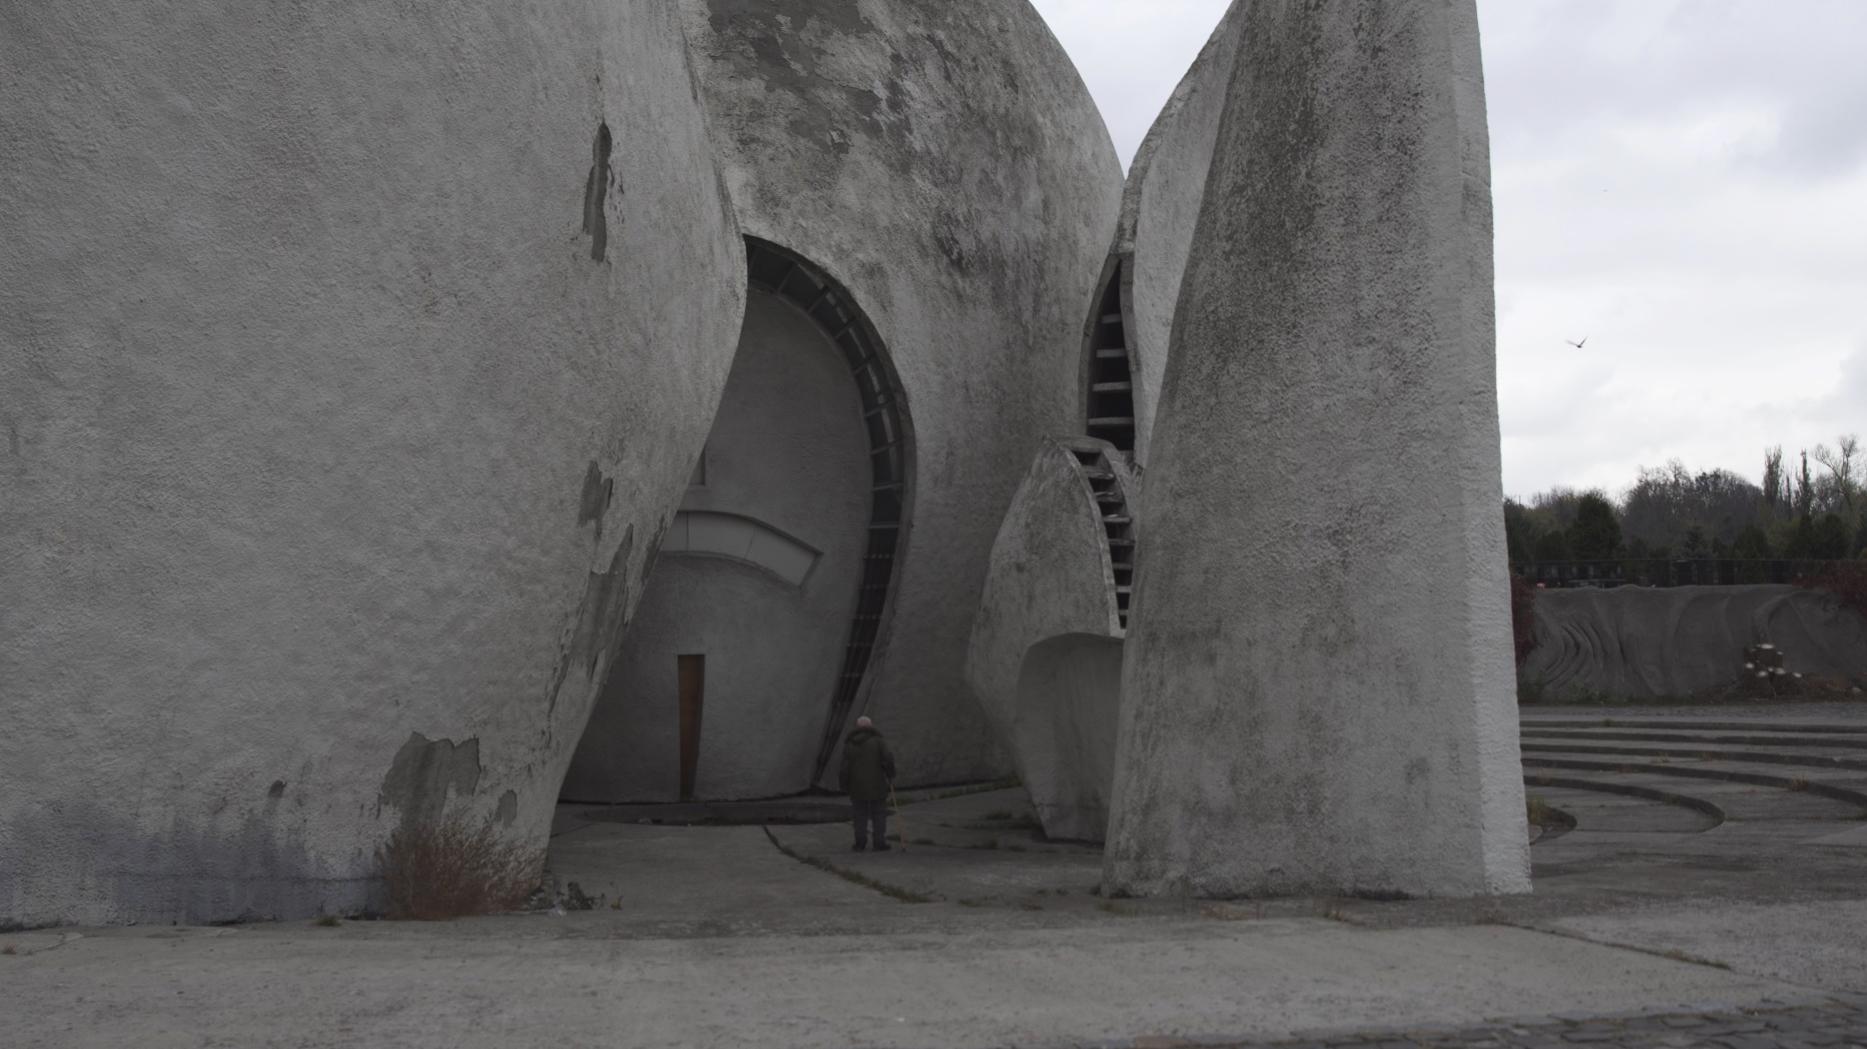 kyiv monumental soviet art